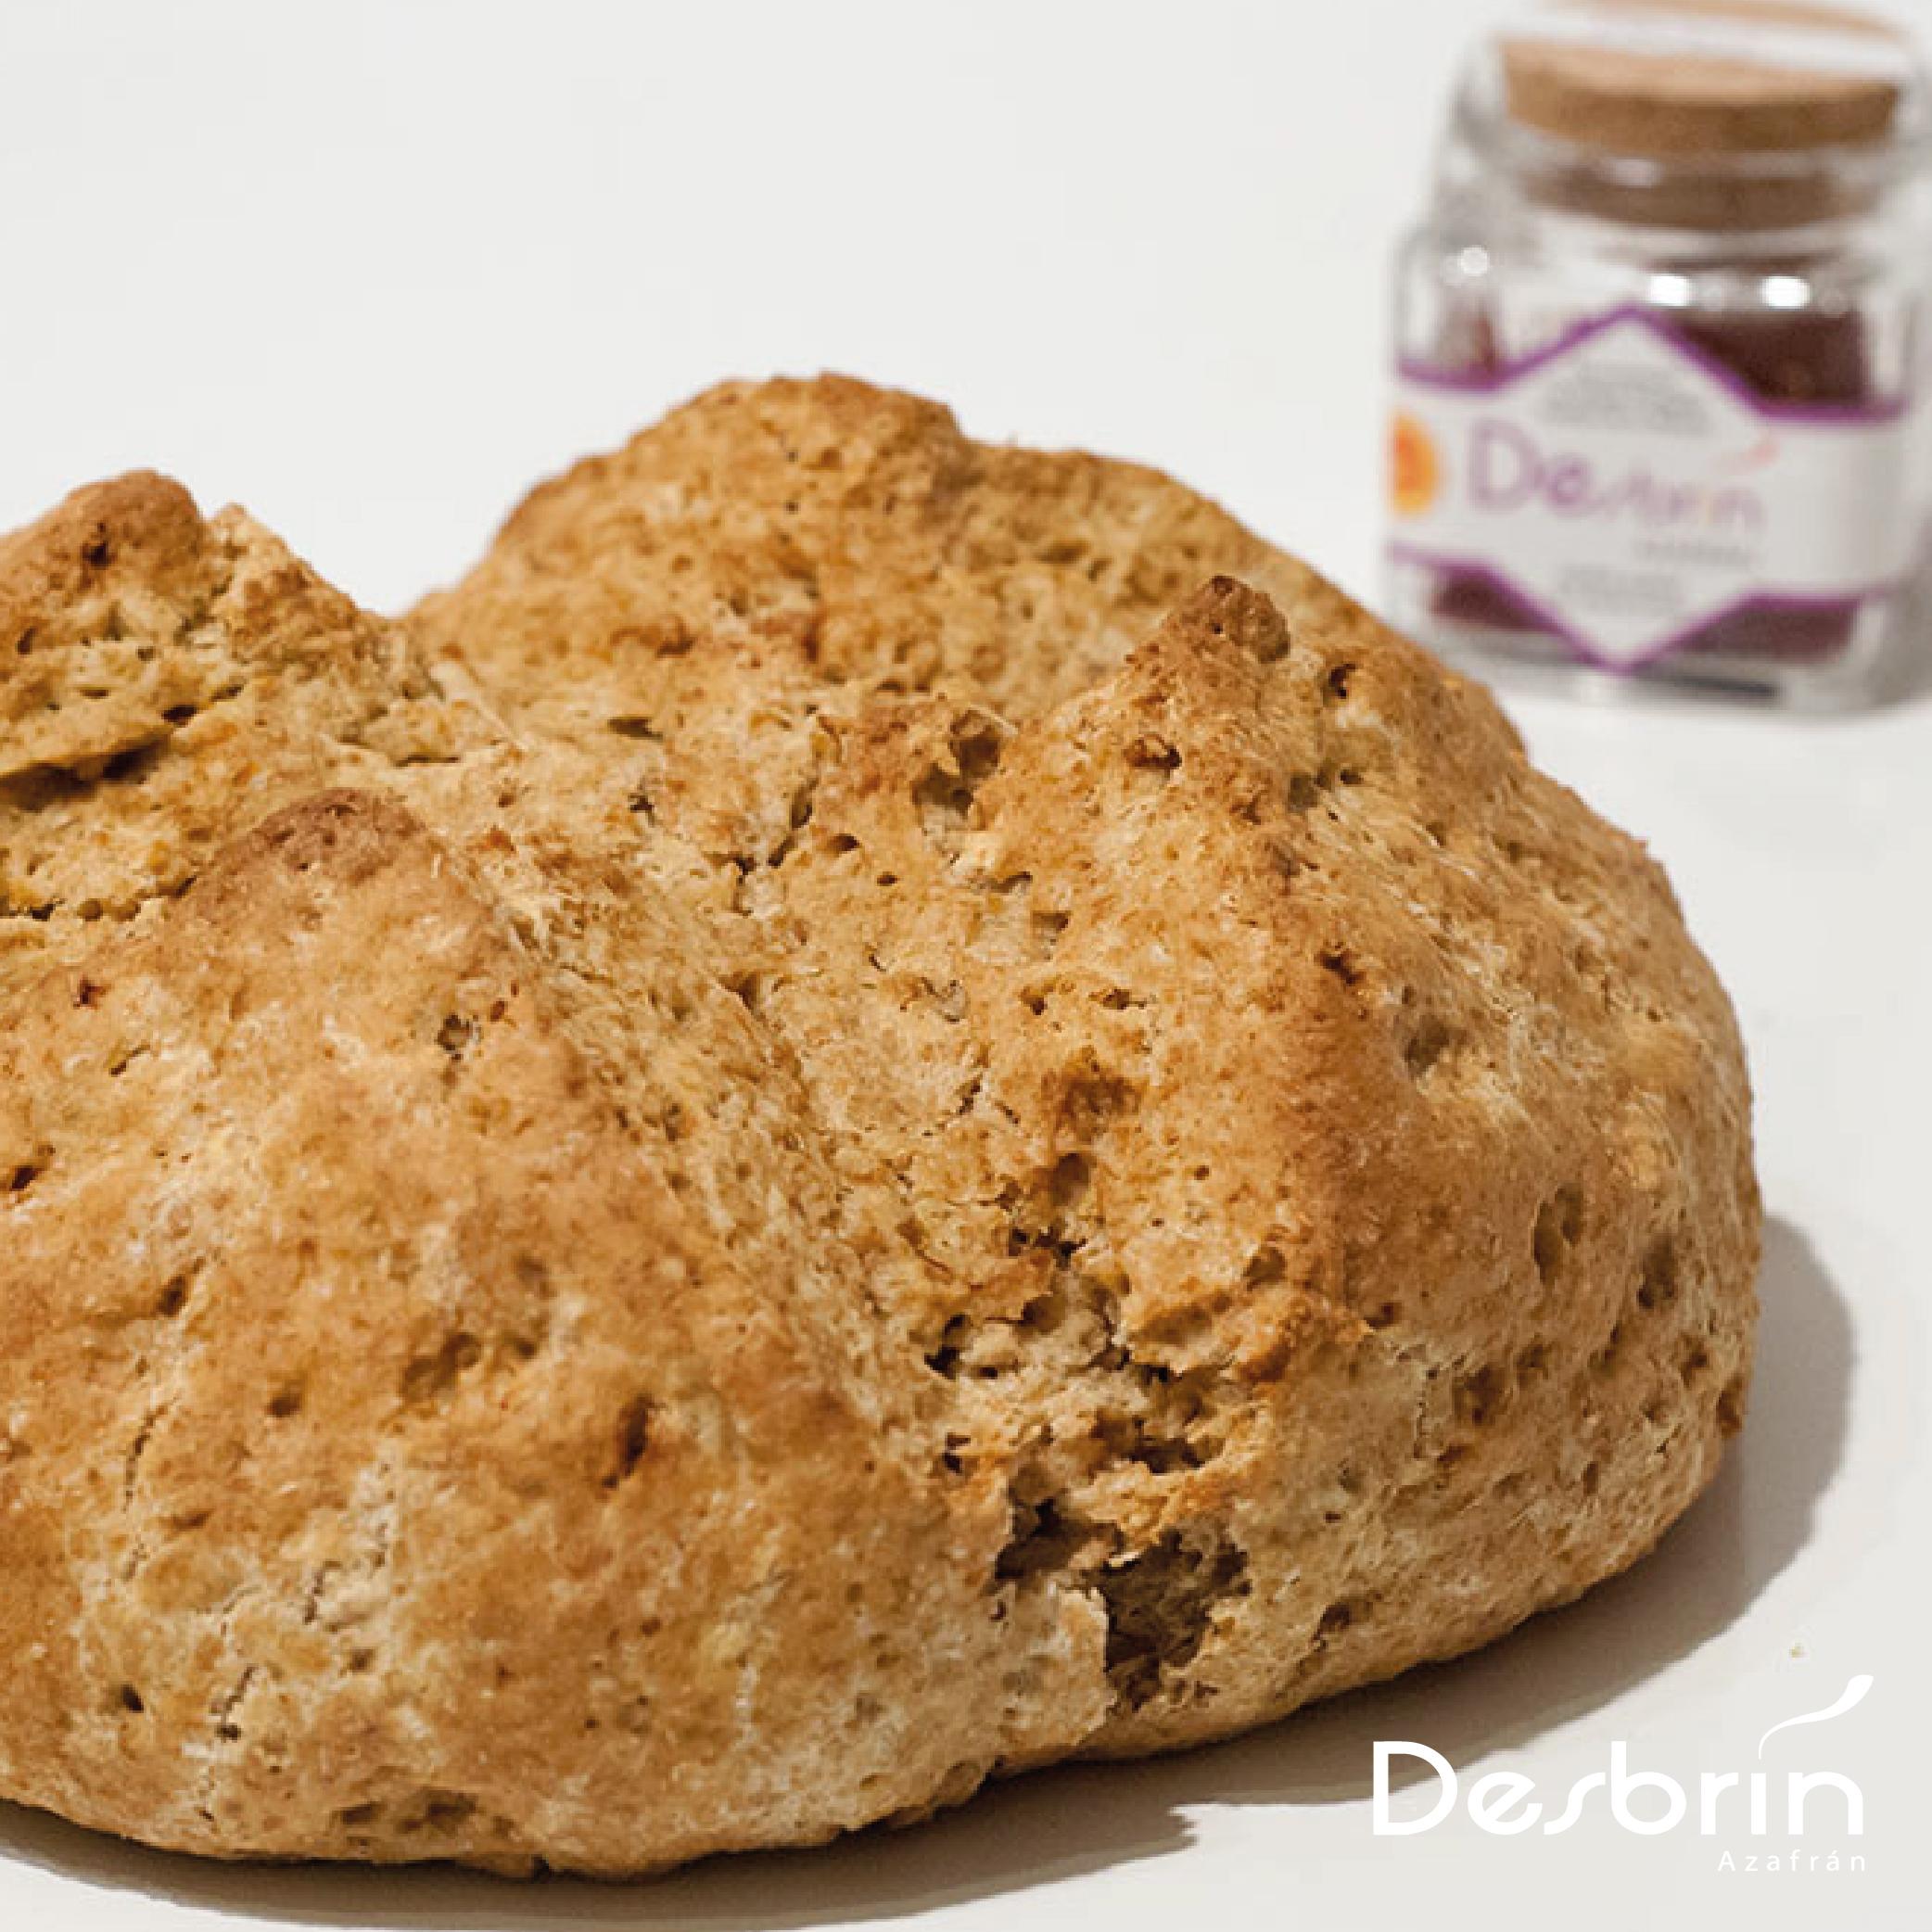 Soda bread al azafrán